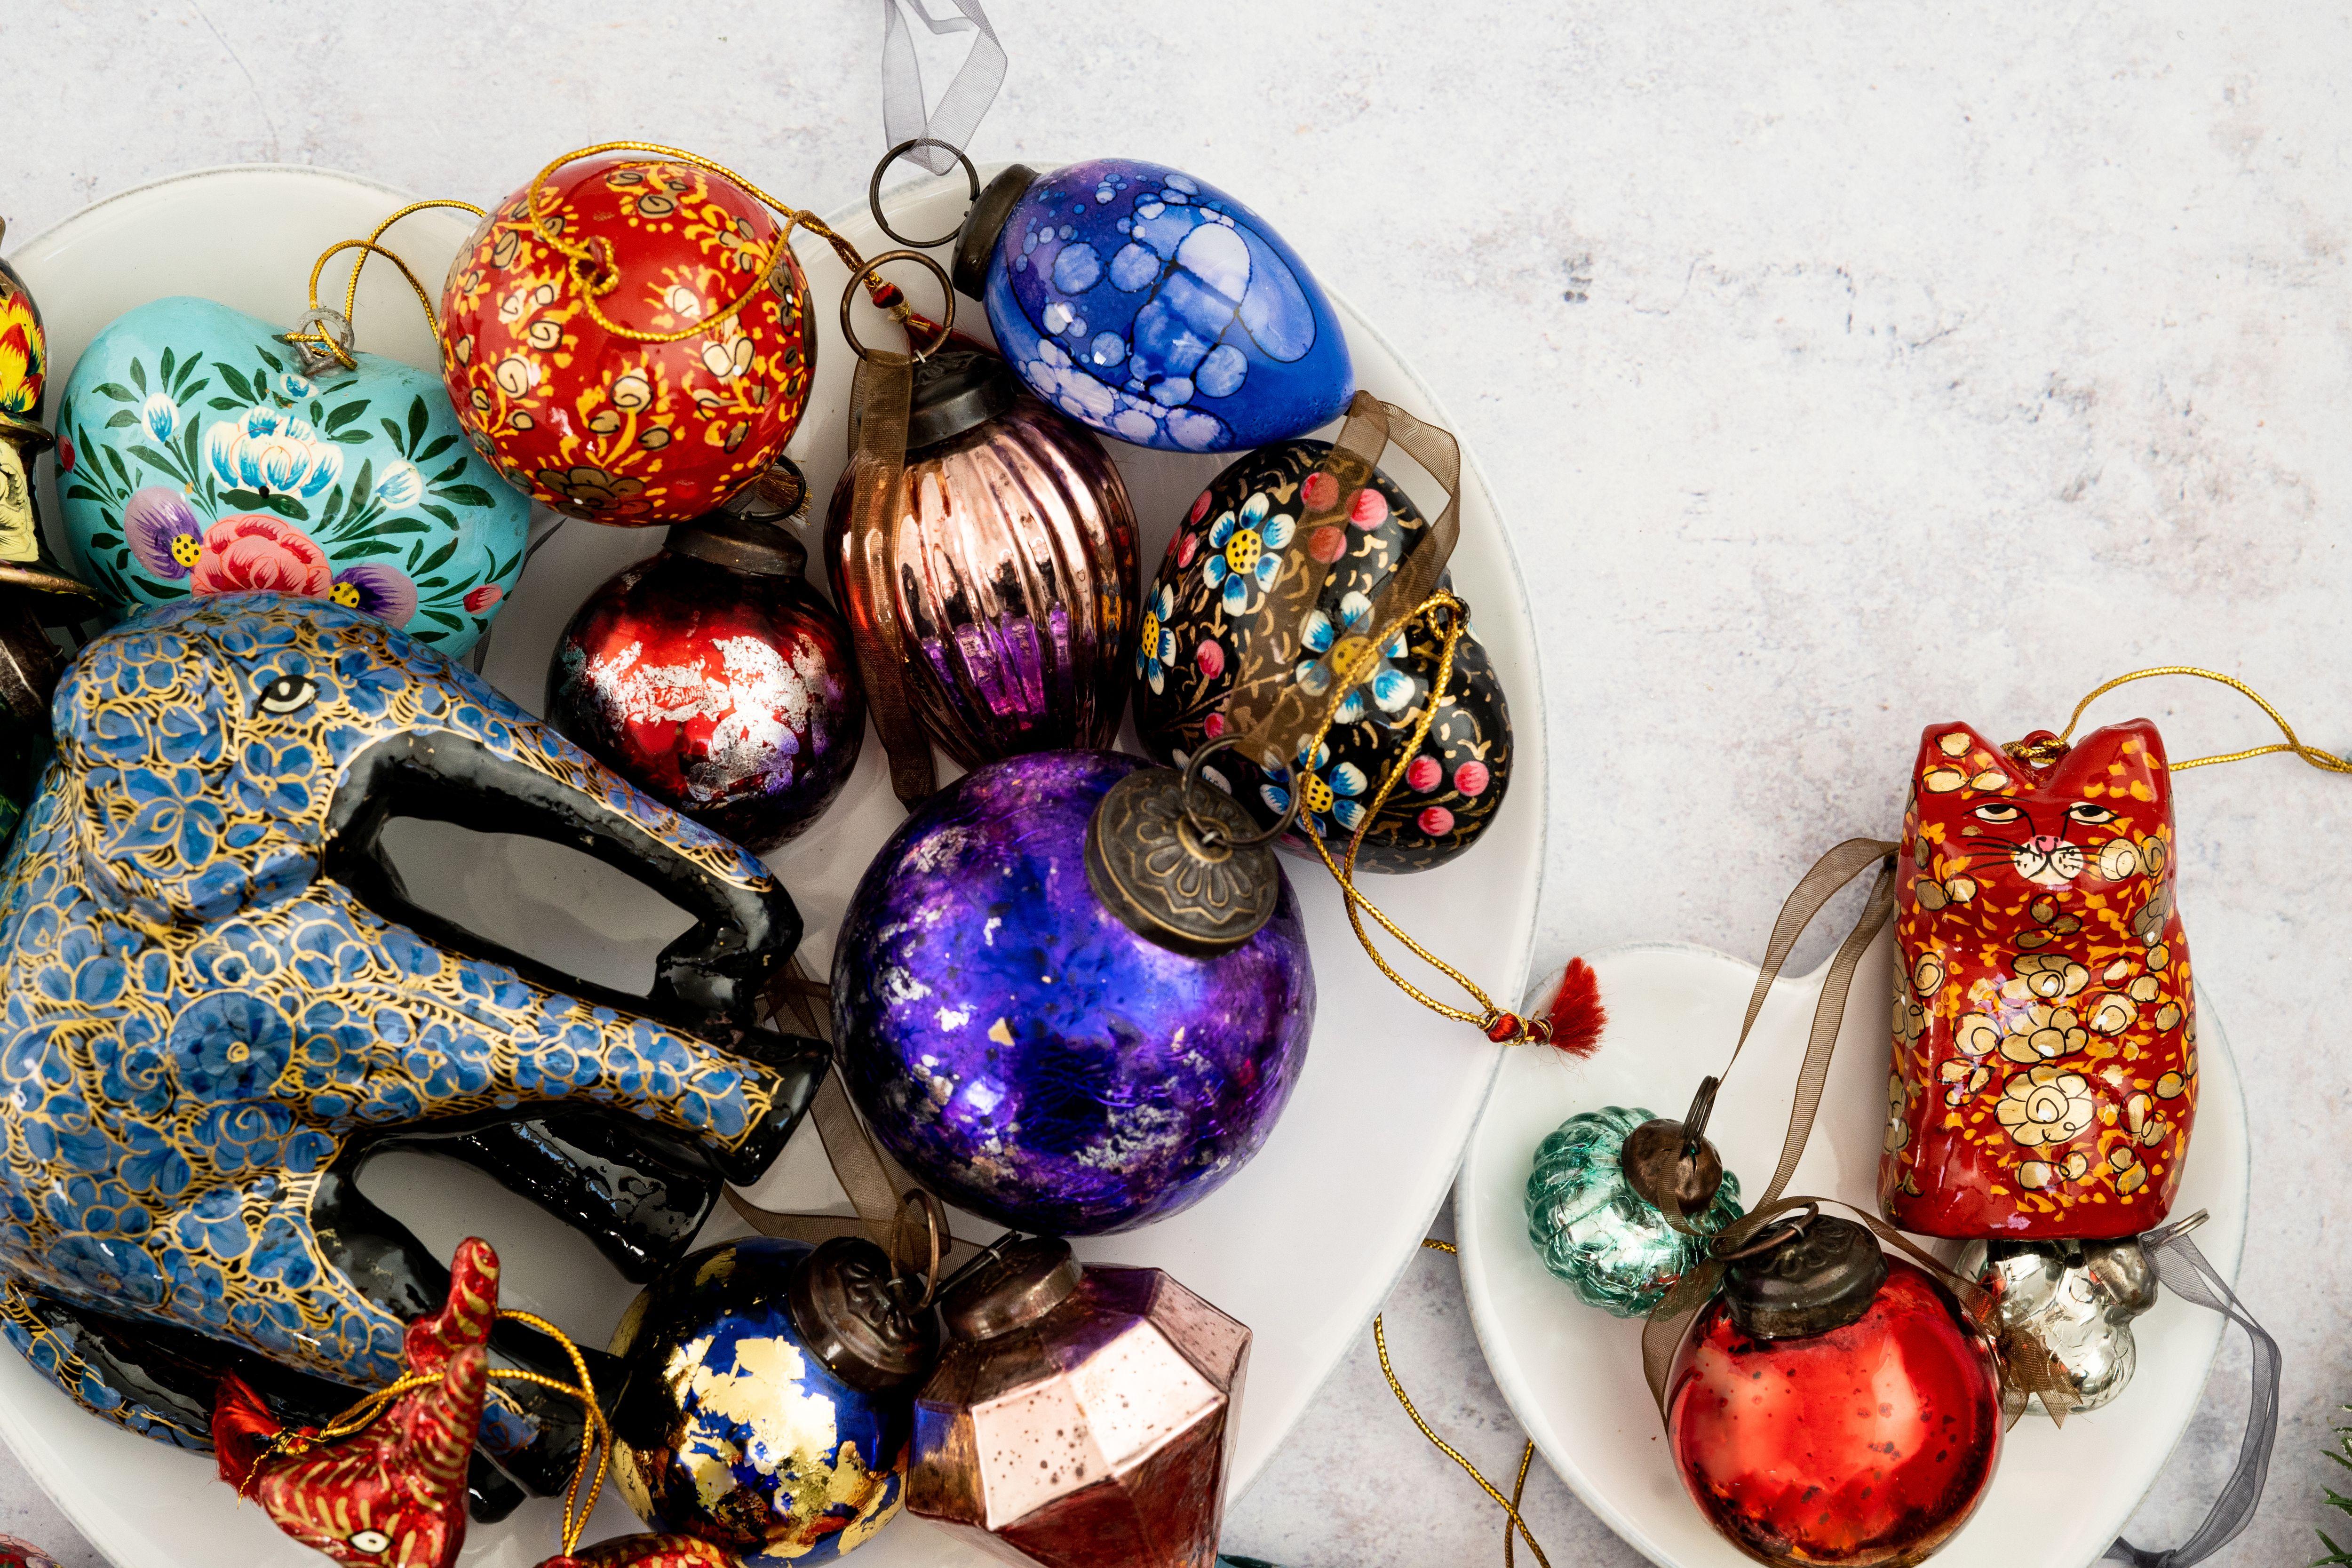 Keep Christmas Colourful This year with Bollywood Christmas #Christmasinspiration #Christmasgram #Christmastable #Christmashome #christmastreedecorations #christmasinspo #christmasinterior #christmashomedecor #christmasballs #christmasstyling #christmasjoy #christmasallyearlong #christmastreedecoration #christmasinnewyork #christmasdesign #xmascountdown #xmasornaments #xmasgiftideas #xmasvibes #xmasmood #xmasdecoration